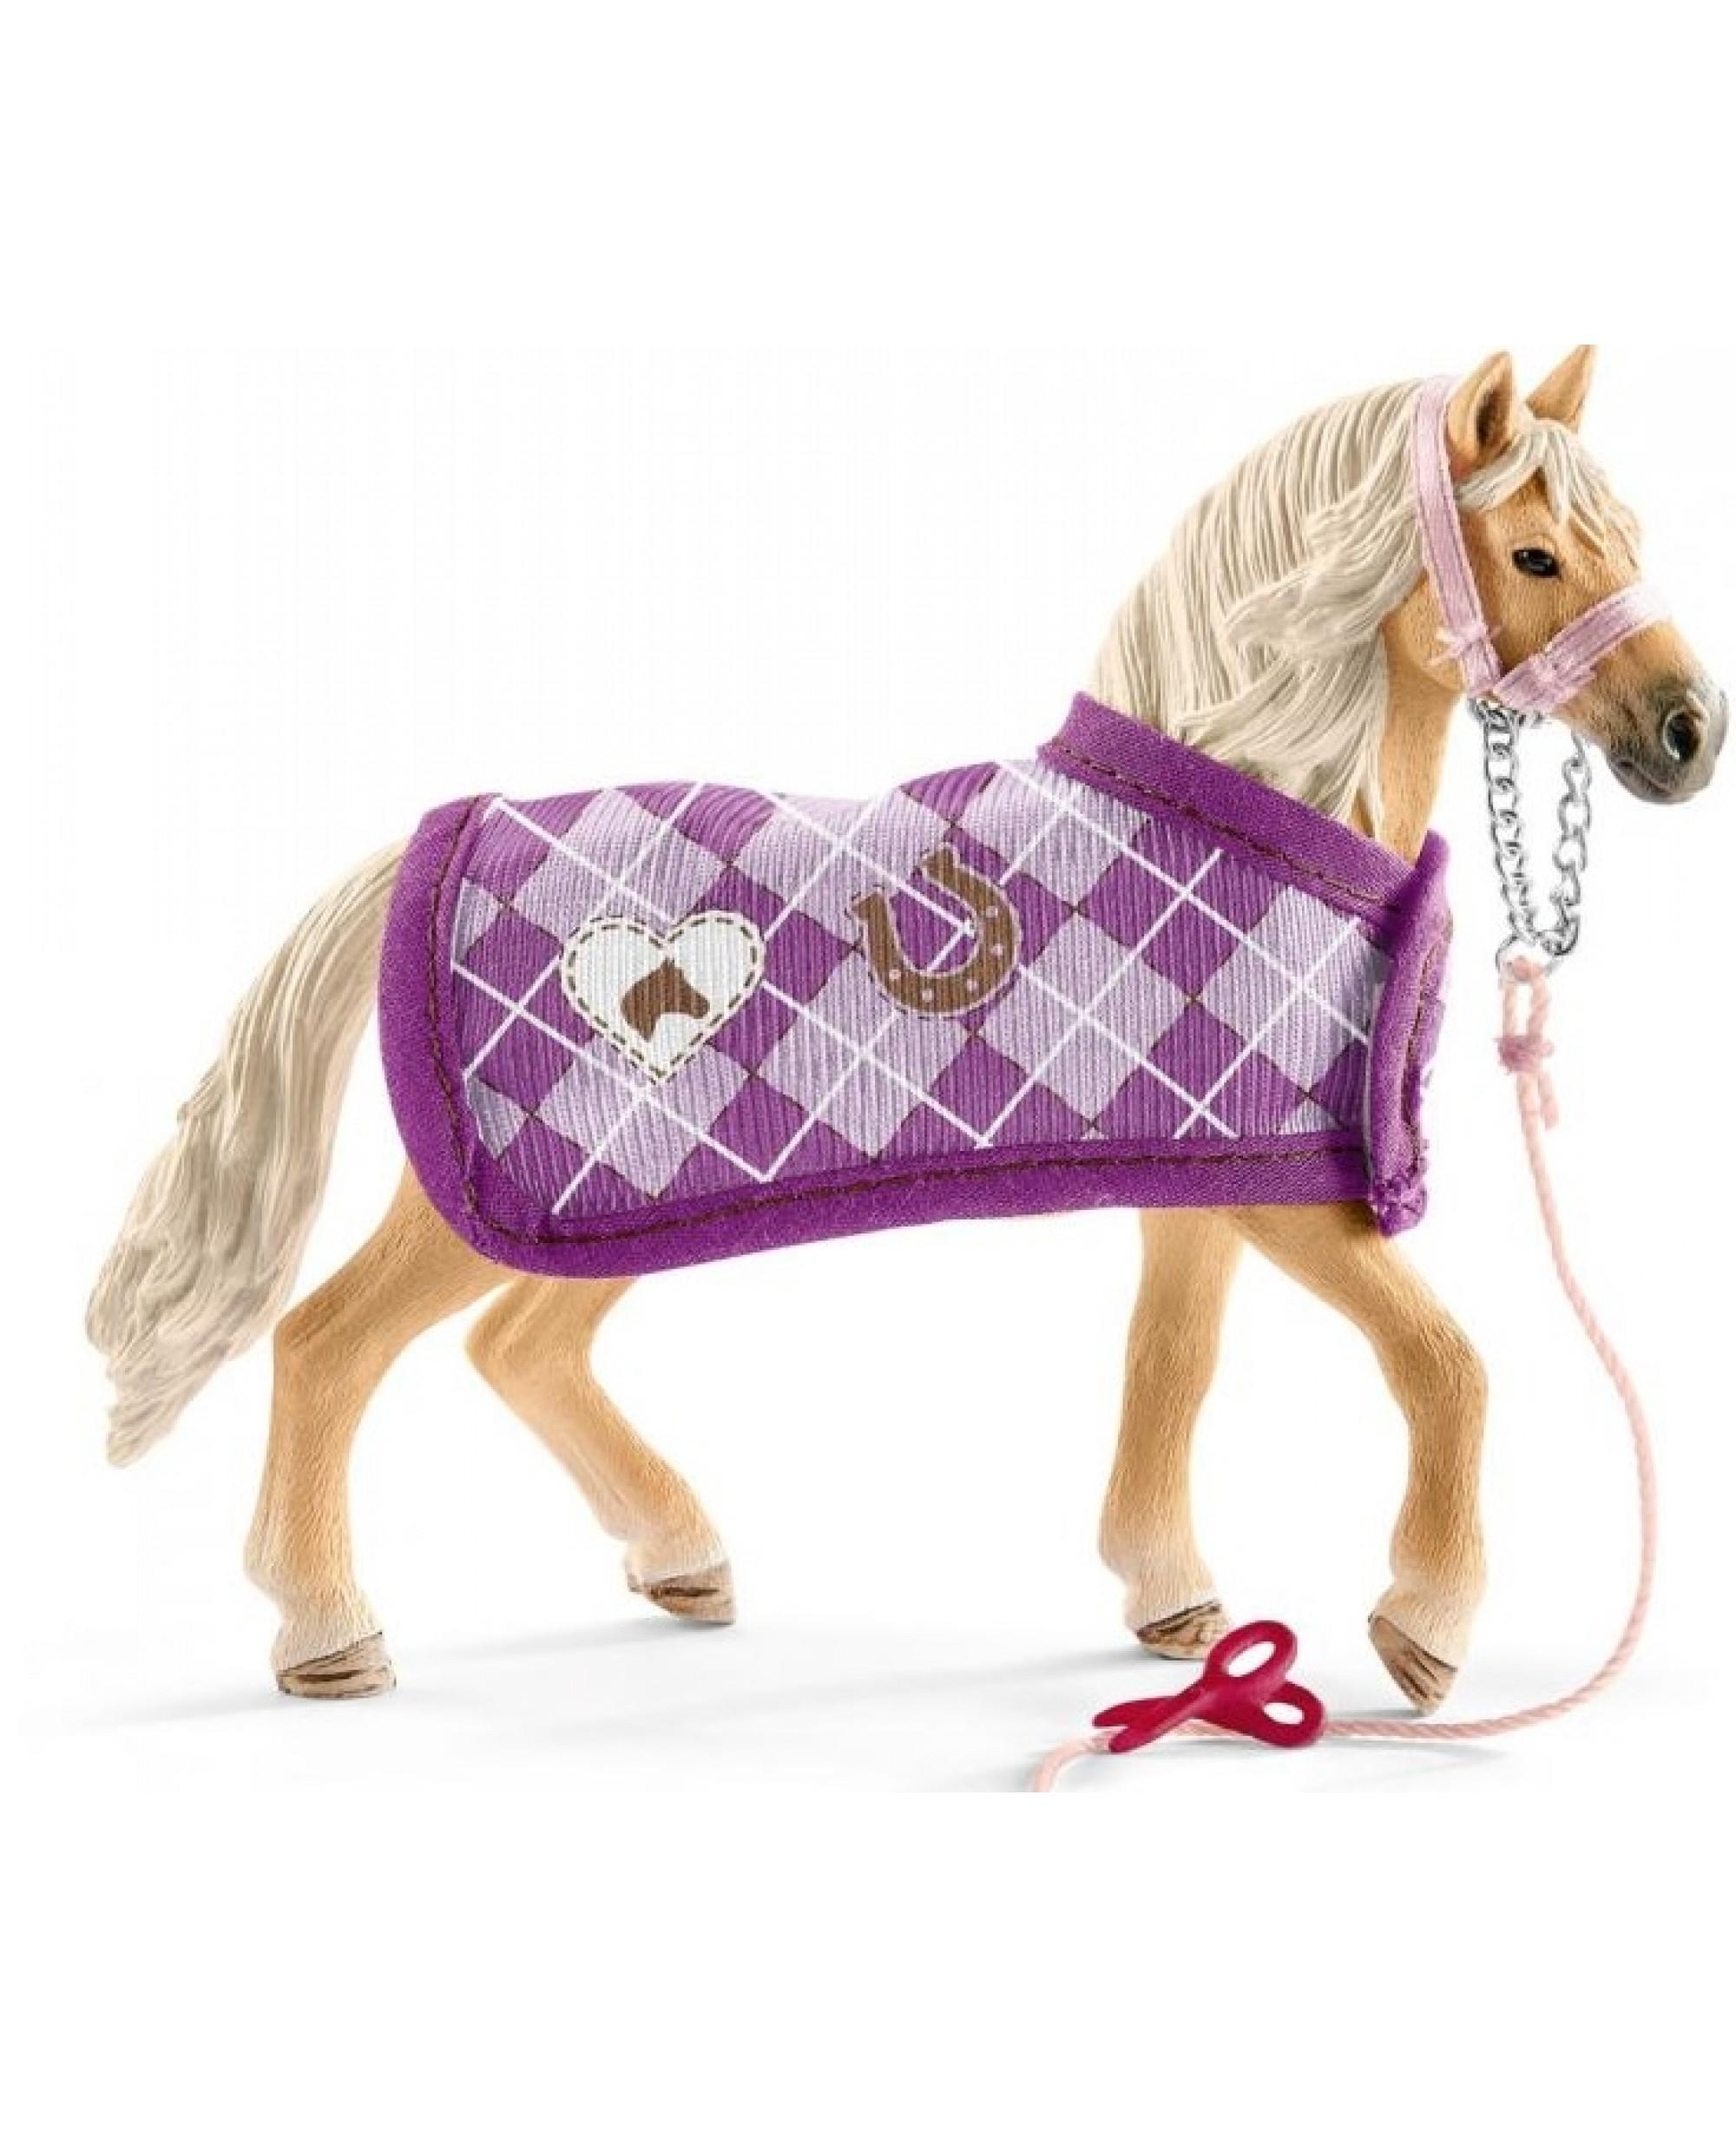 Schleich - Horse Club Sofia's Fashion Creation (42431)